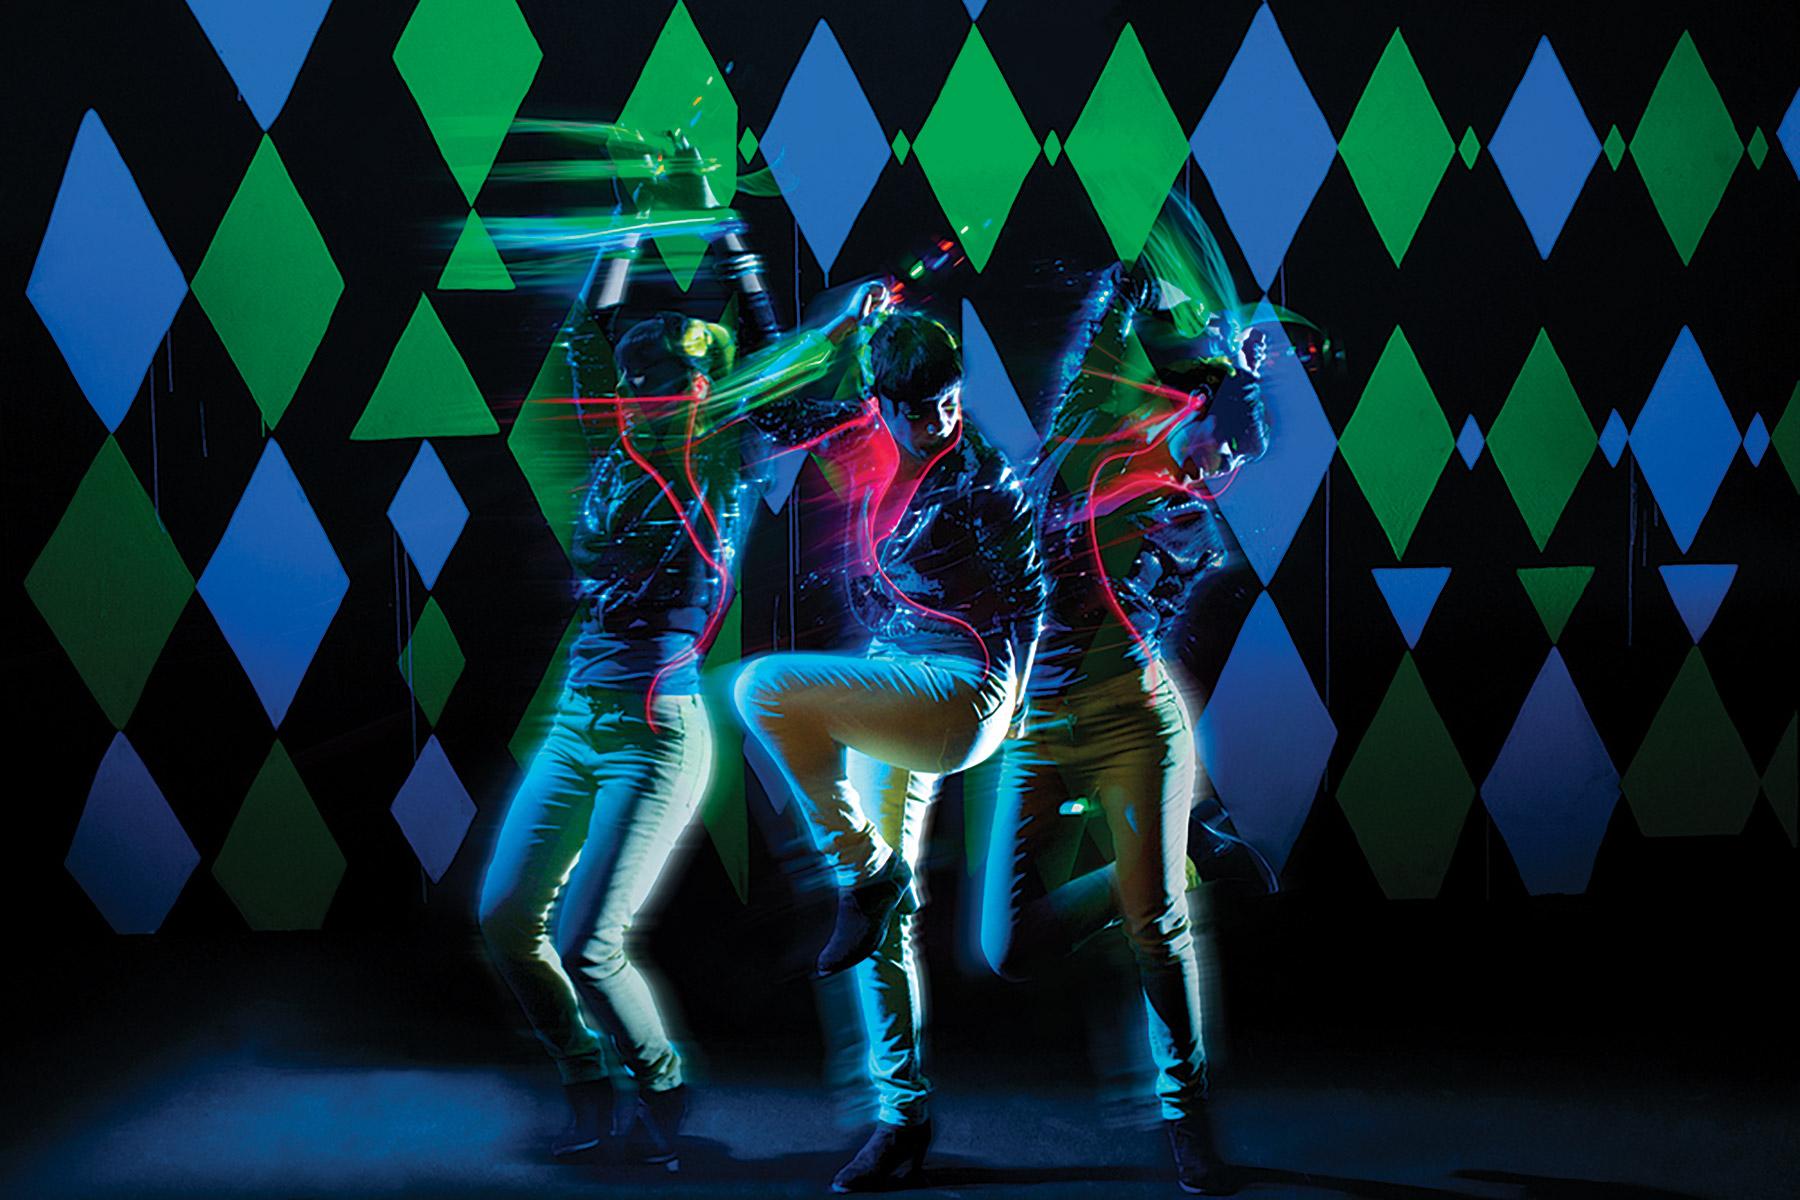 Smirnoff Midnight Circus: Tune In